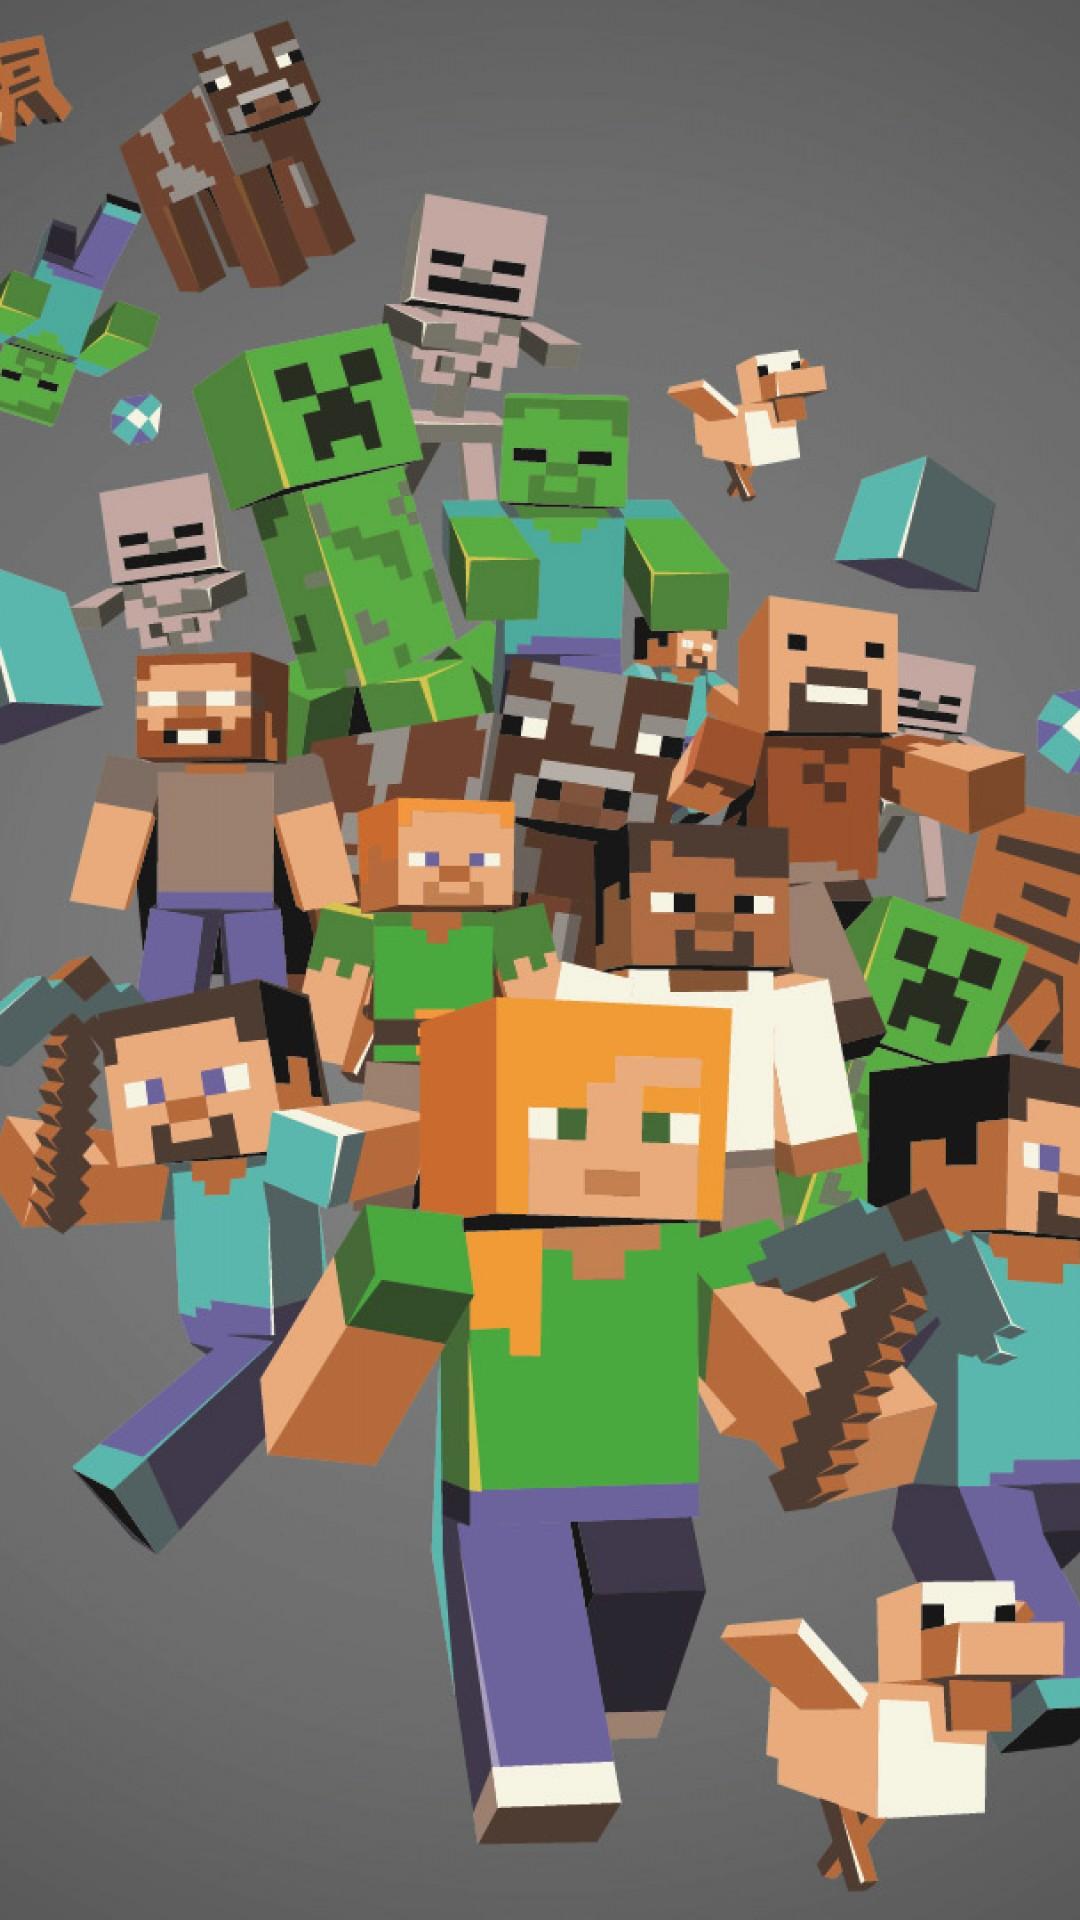 Minecraft Steve Wallpapers On Wallpaperdog